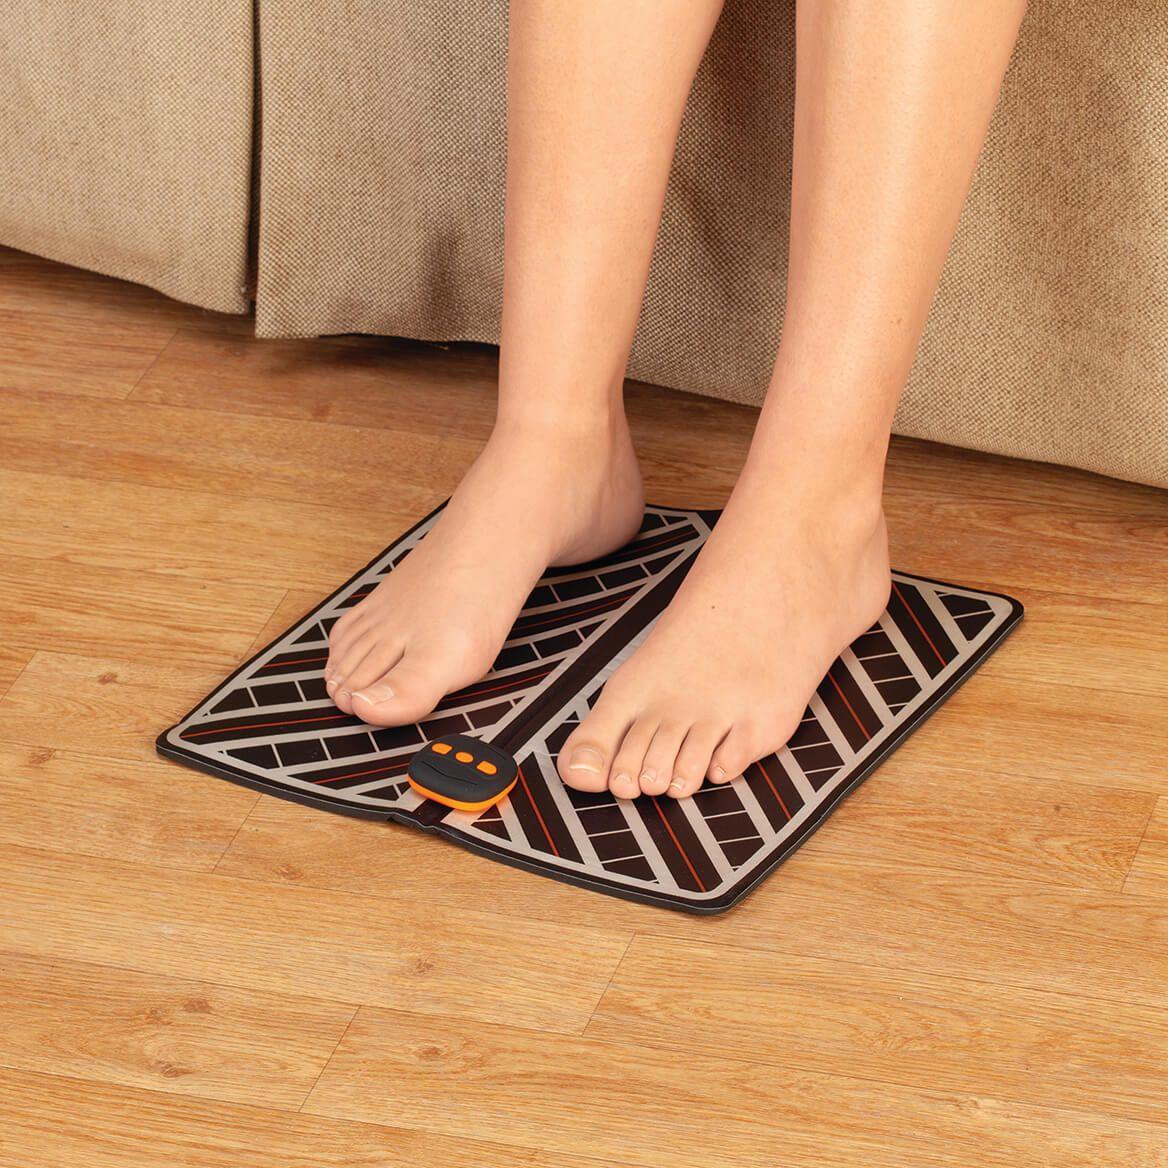 Circulation Pro™ EMS Foot Massager-371942